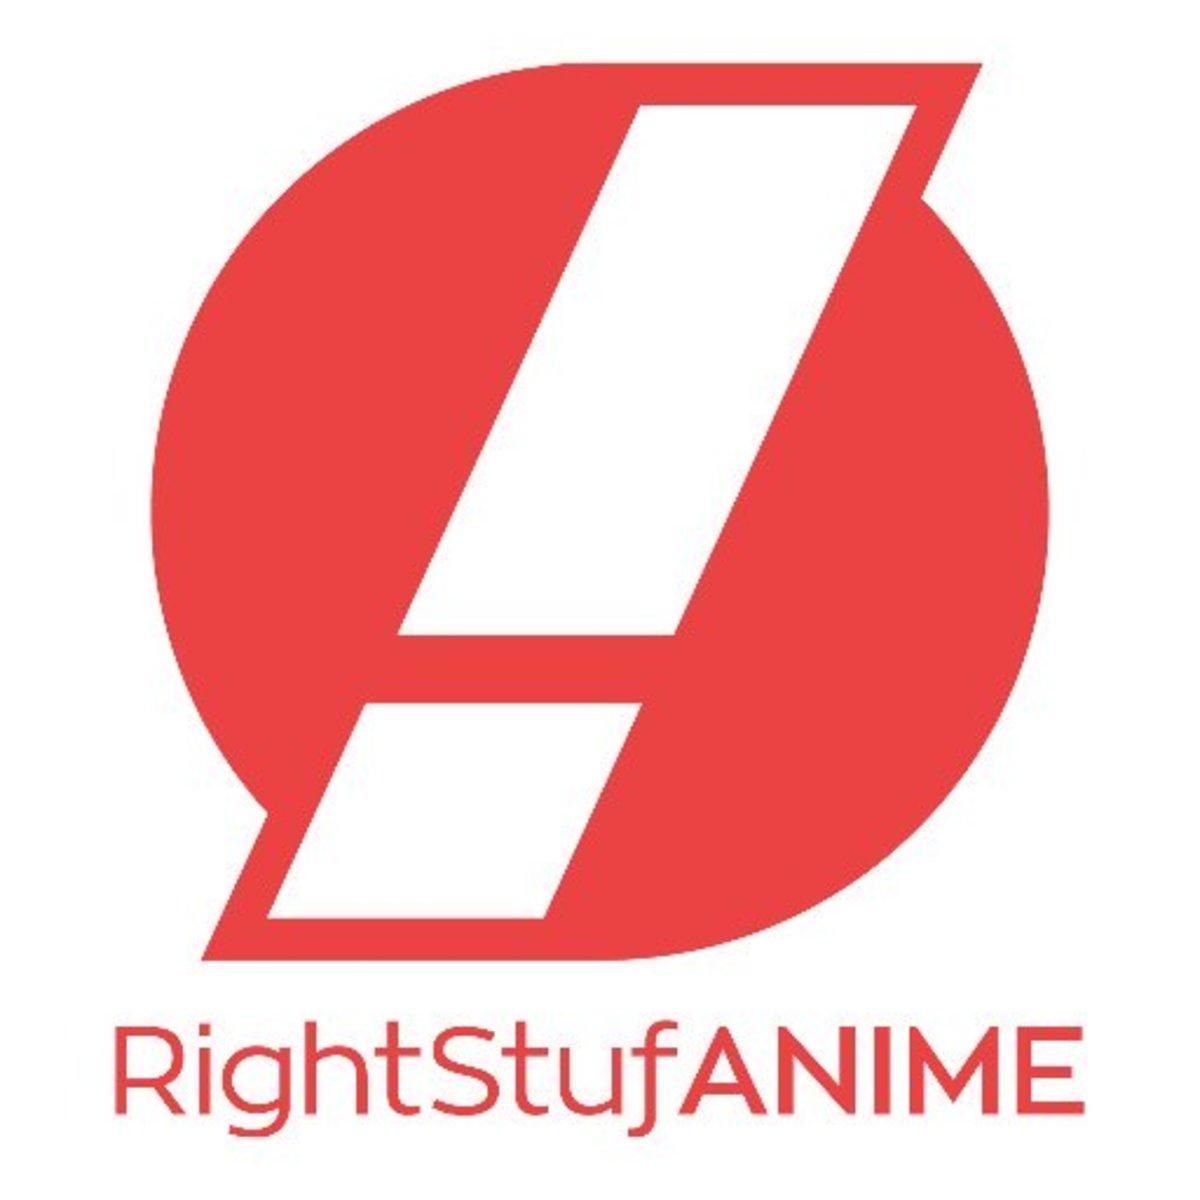 Website Review: RightStufAnime.com